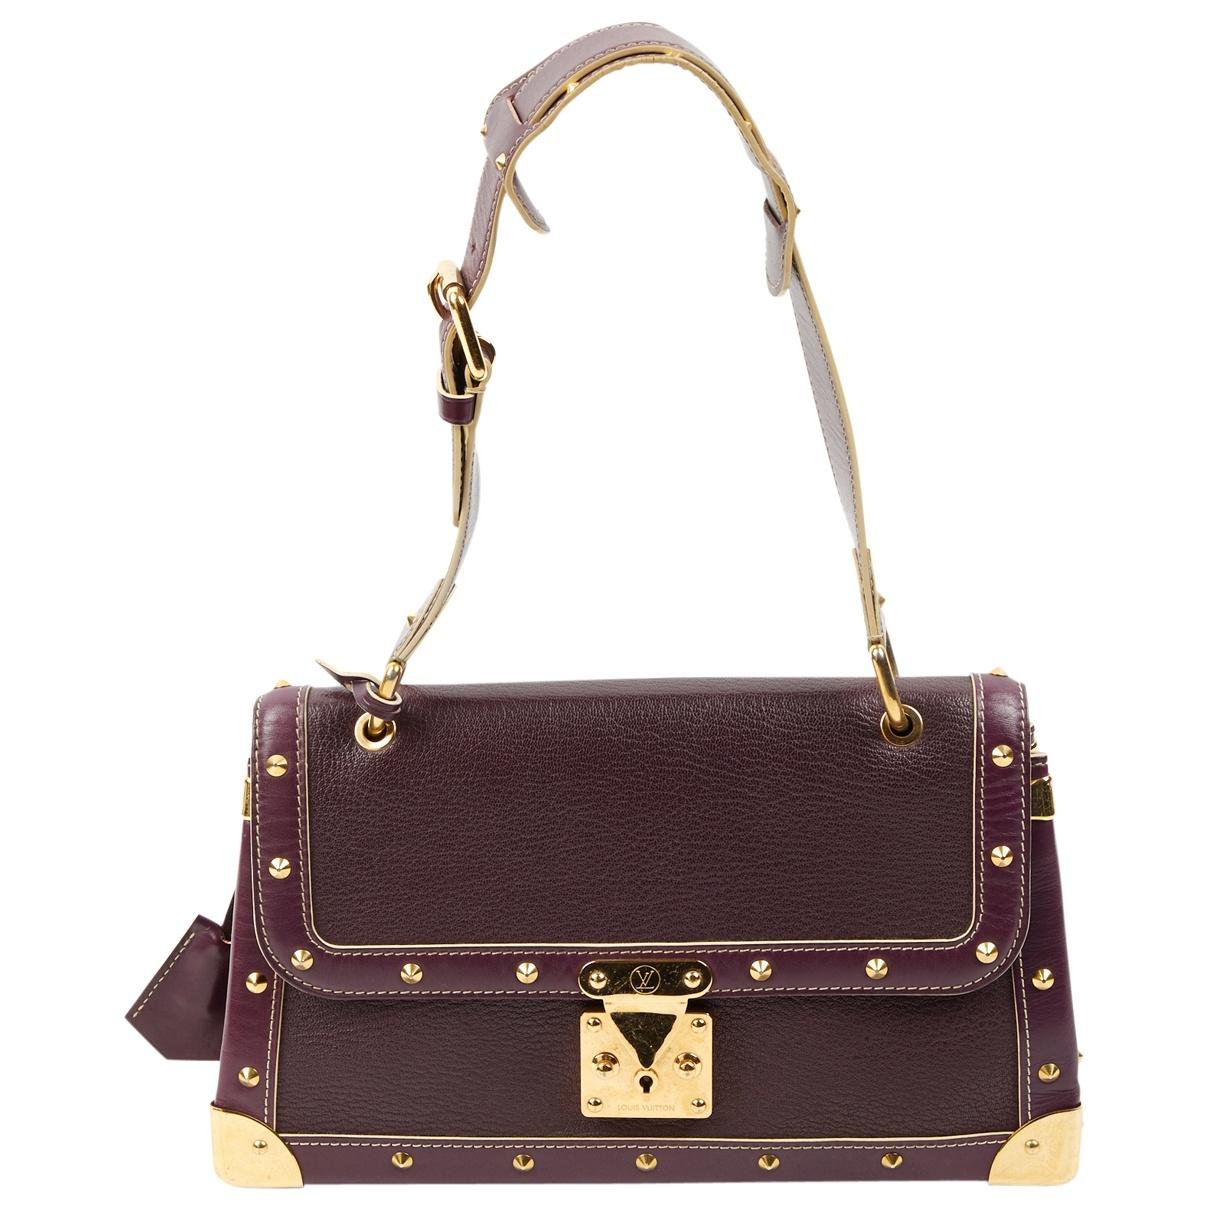 Louis Vuitton \N Purple Leather handbag for Women \N